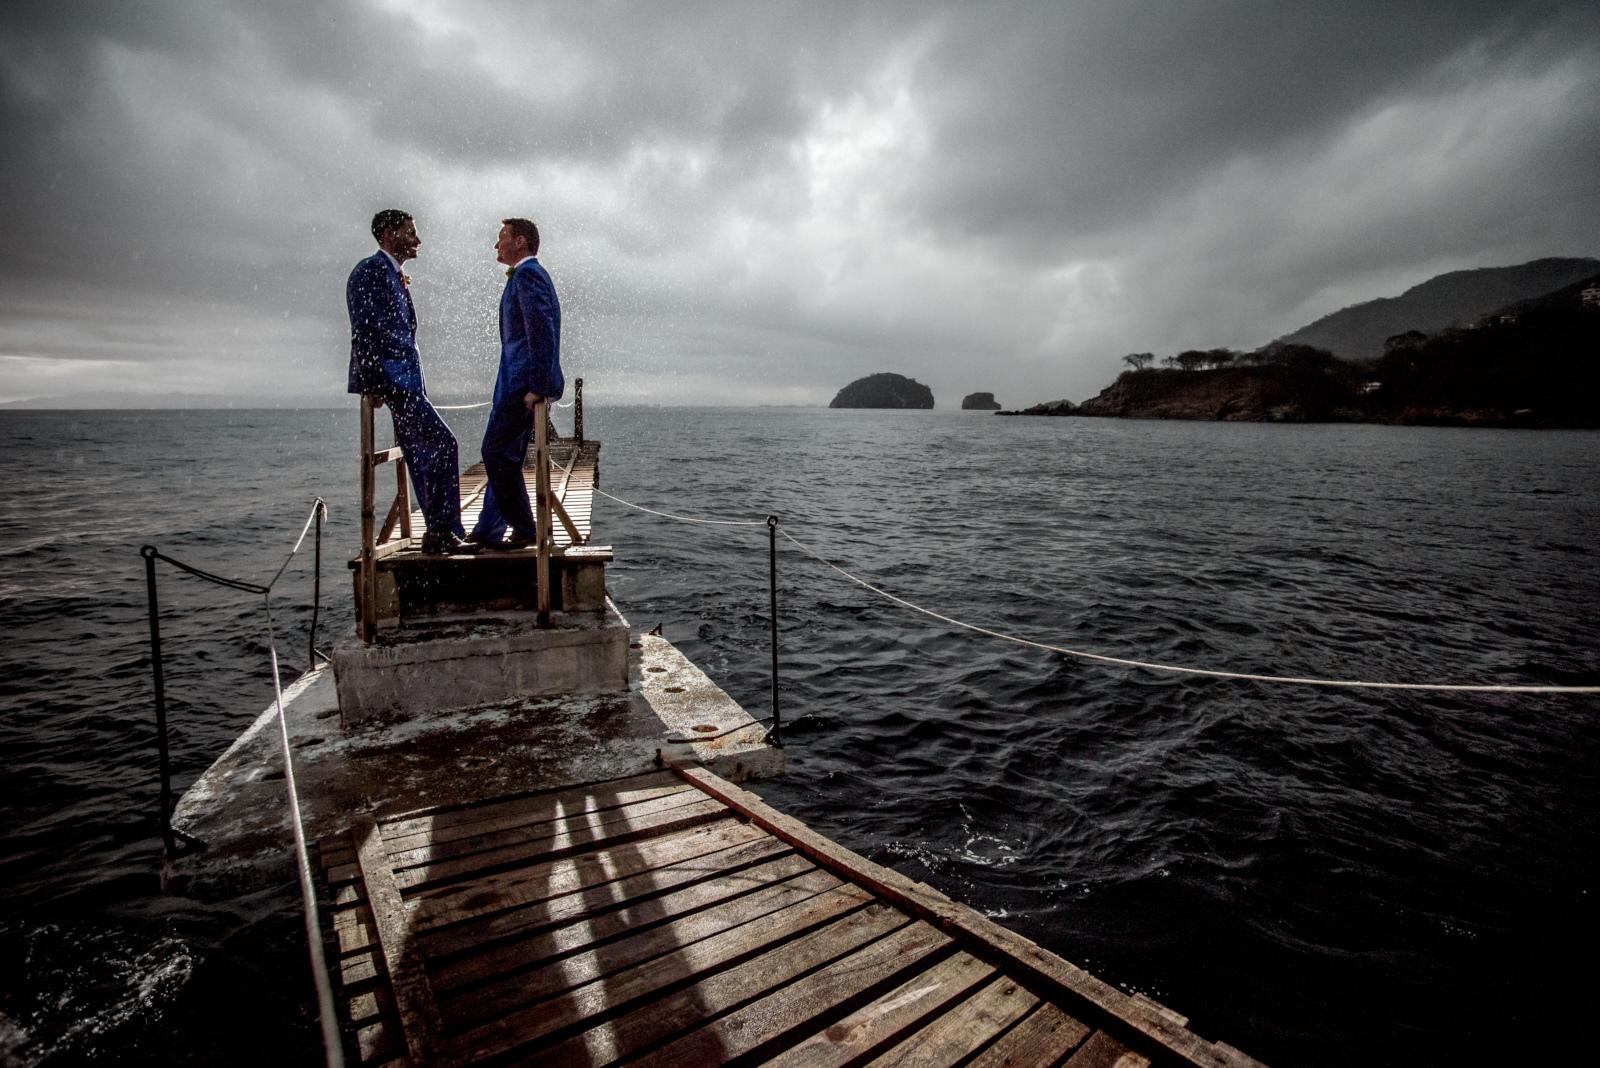 Wedding photographer in Puerto Vallarta, Sayulita, Punta Mita, Nayarit, Mexico - LGBT same sex mariage - Couple under the rain